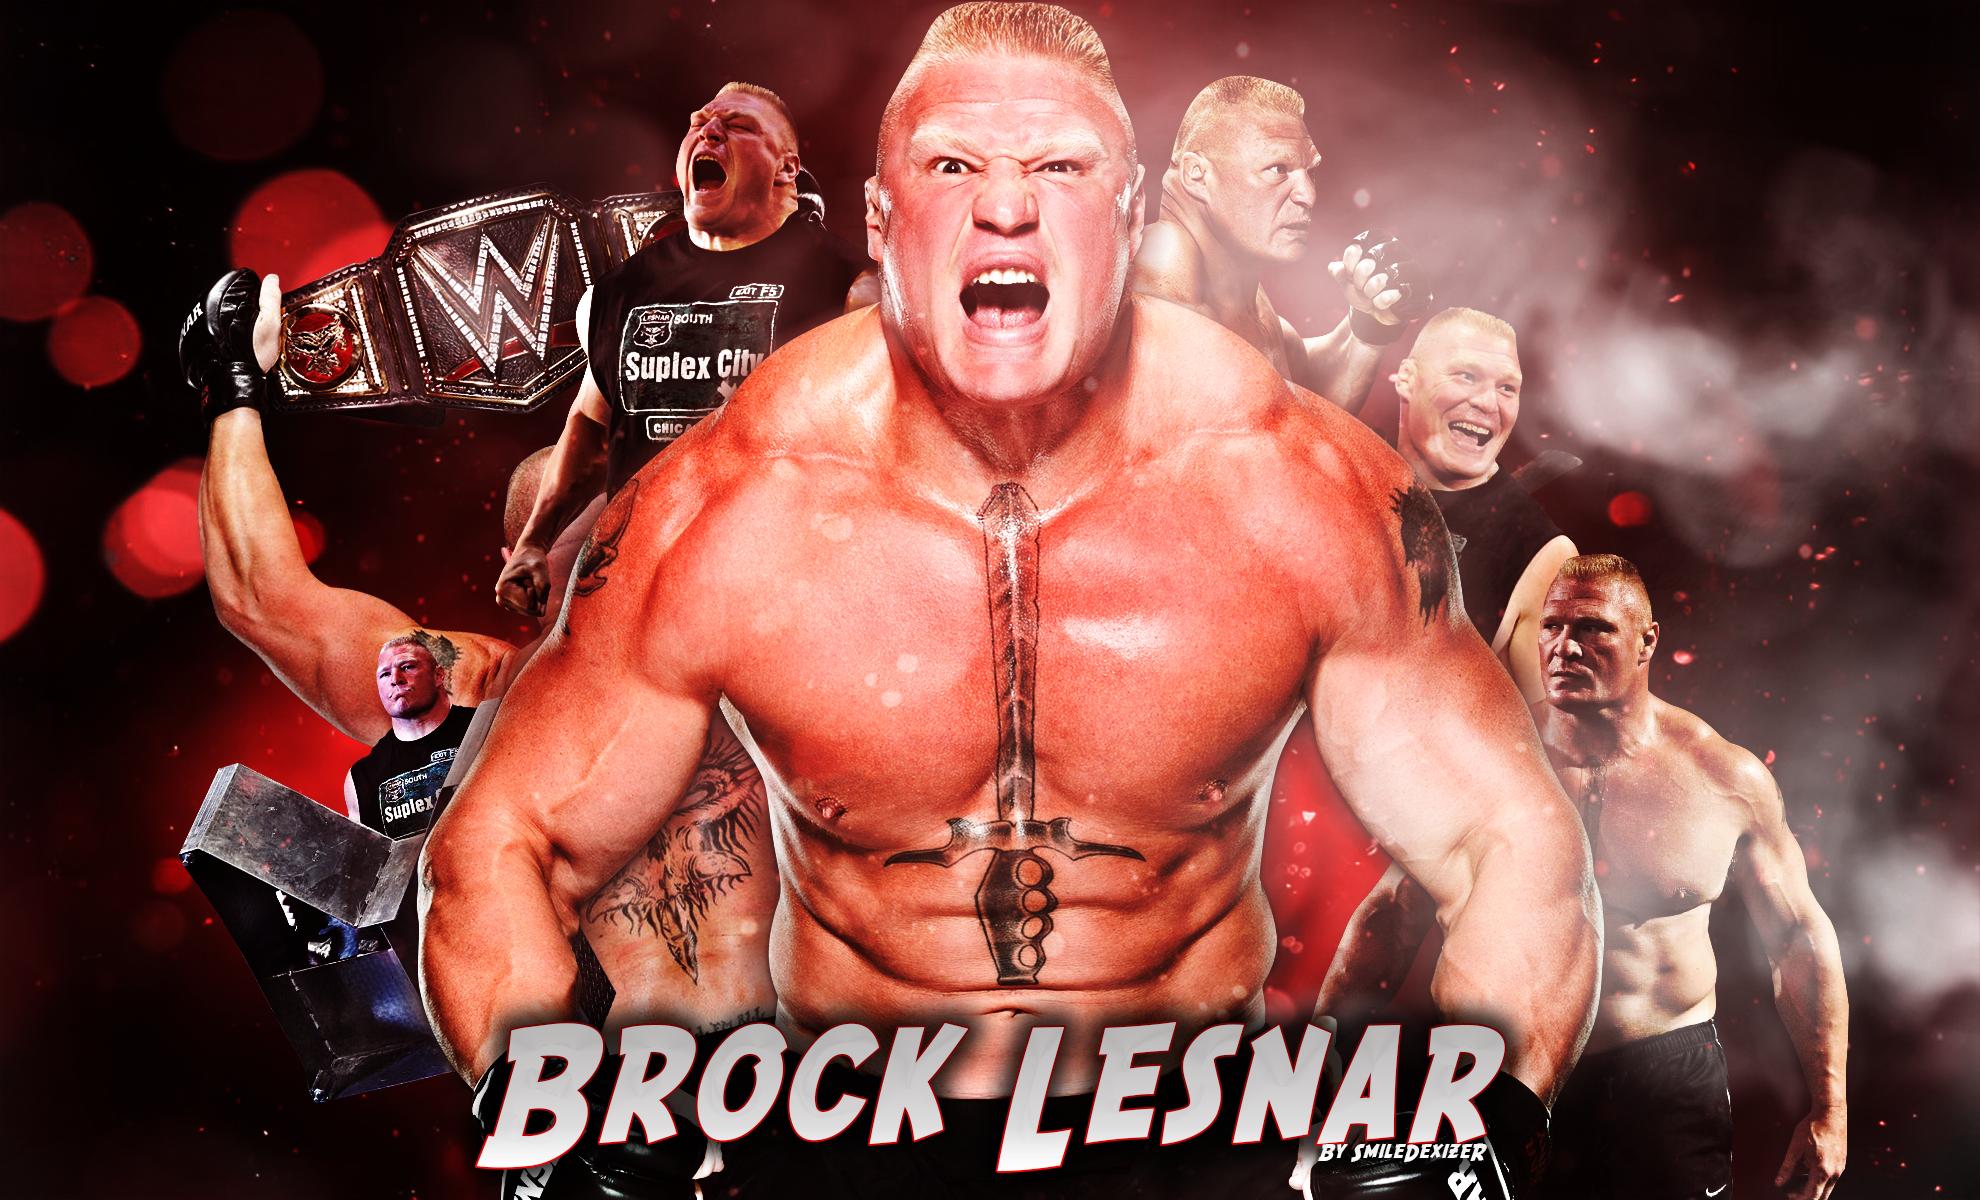 New WWE 2016 Brock Lesnar HD Wallpaper By SmileDexizeR